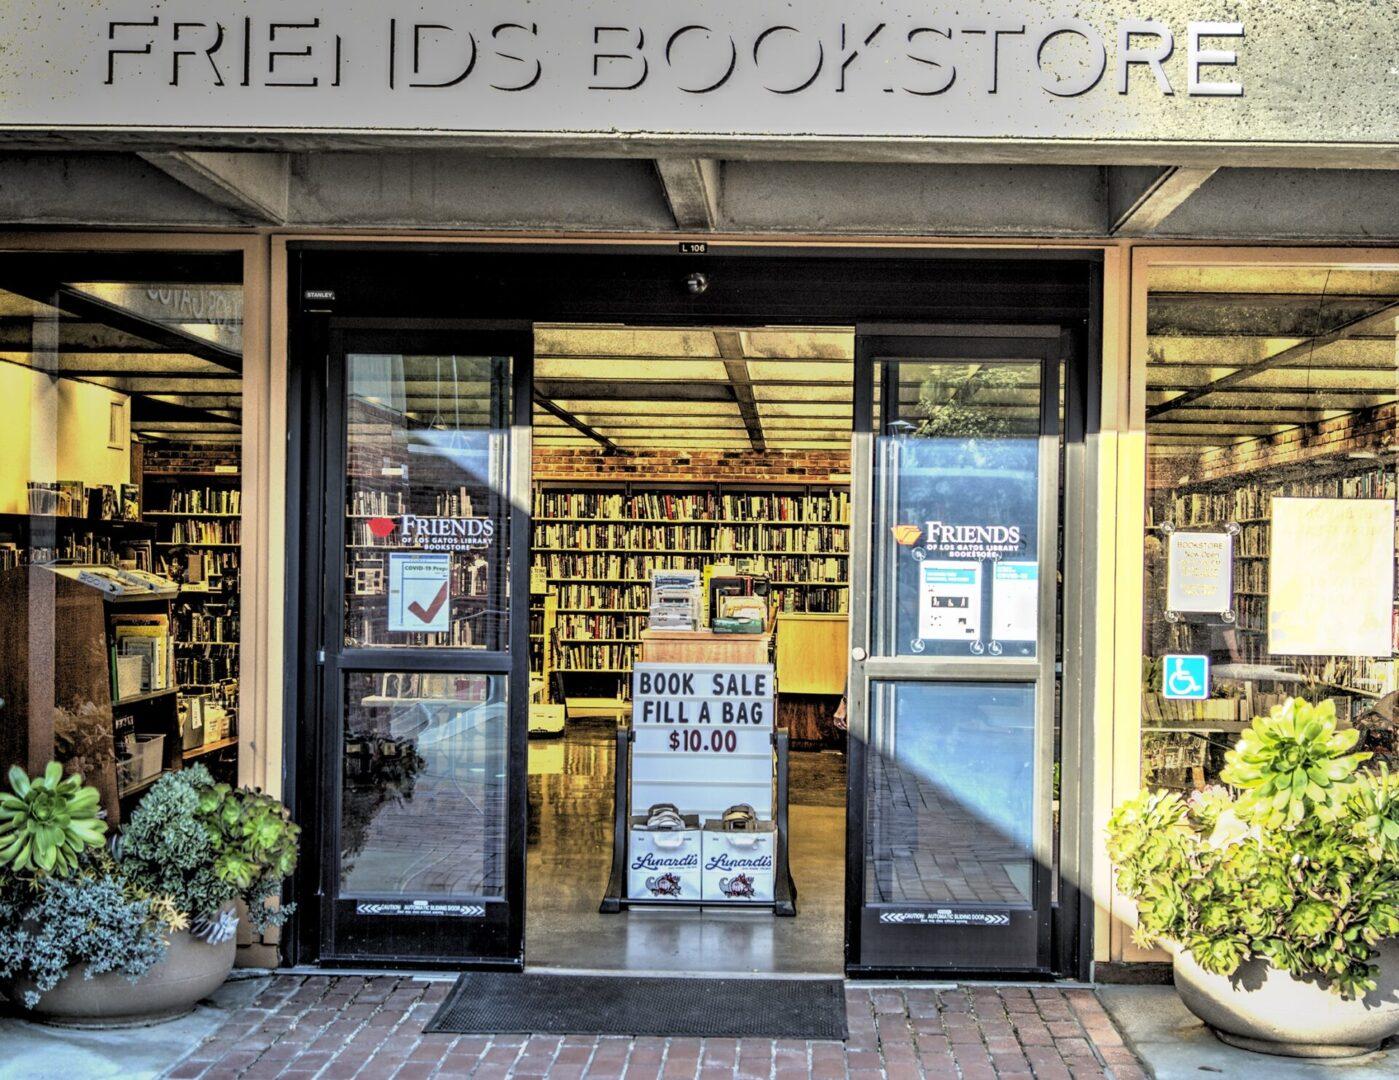 friends bookstore wide 7.5